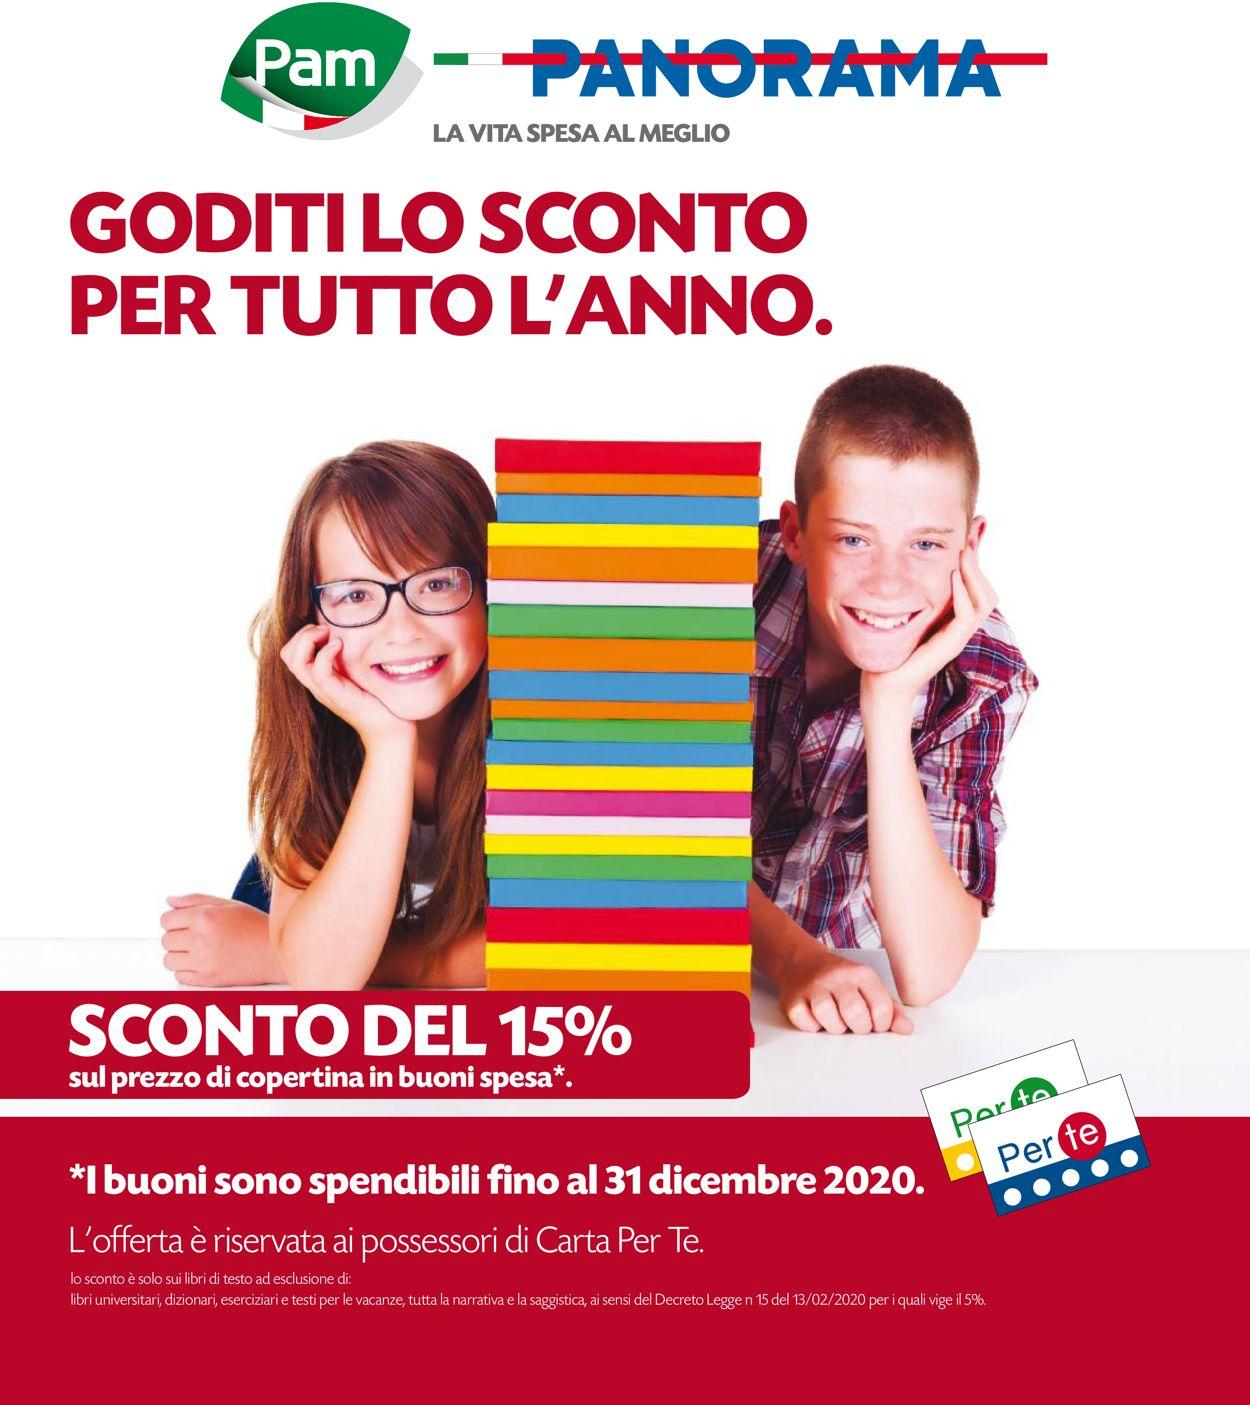 Volantino Pam Panorama - Black Friday 2020 - Offerte 26/11-06/12/2020 (Pagina 17)